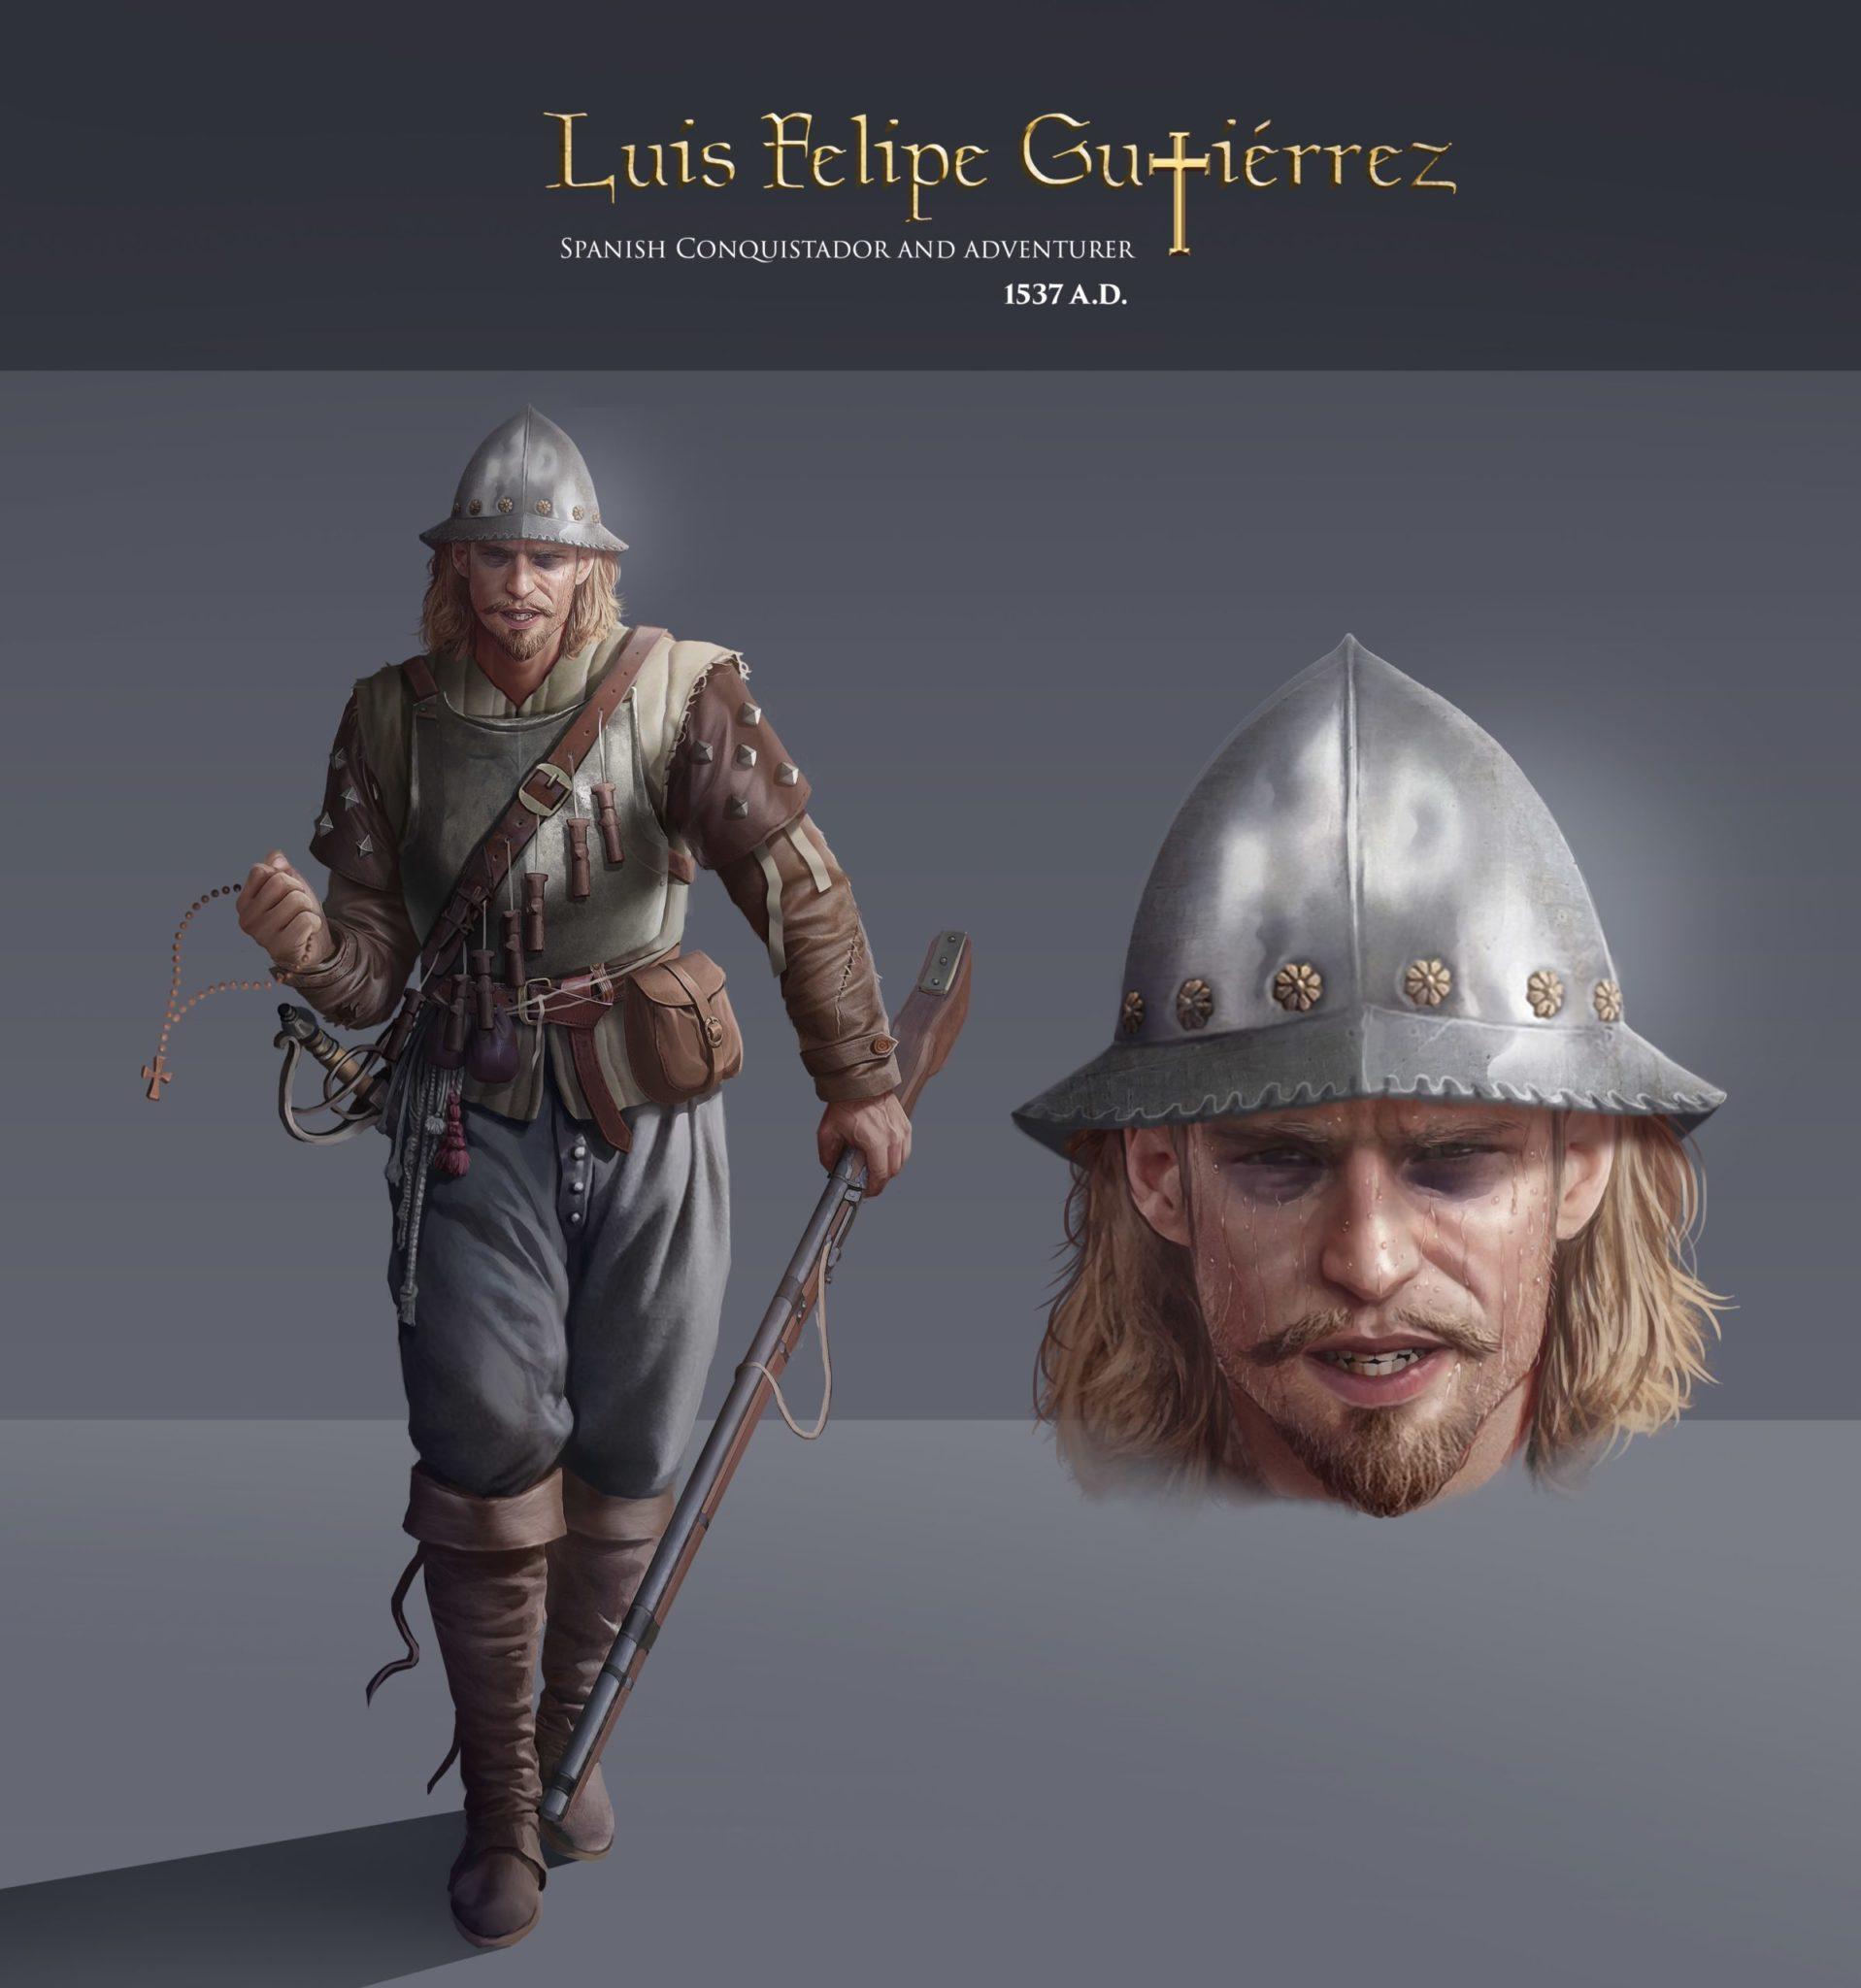 Luis Felipe Gutierrez, Spanish Conquistador, the New World (Modern Day, Peru), 1537 CE